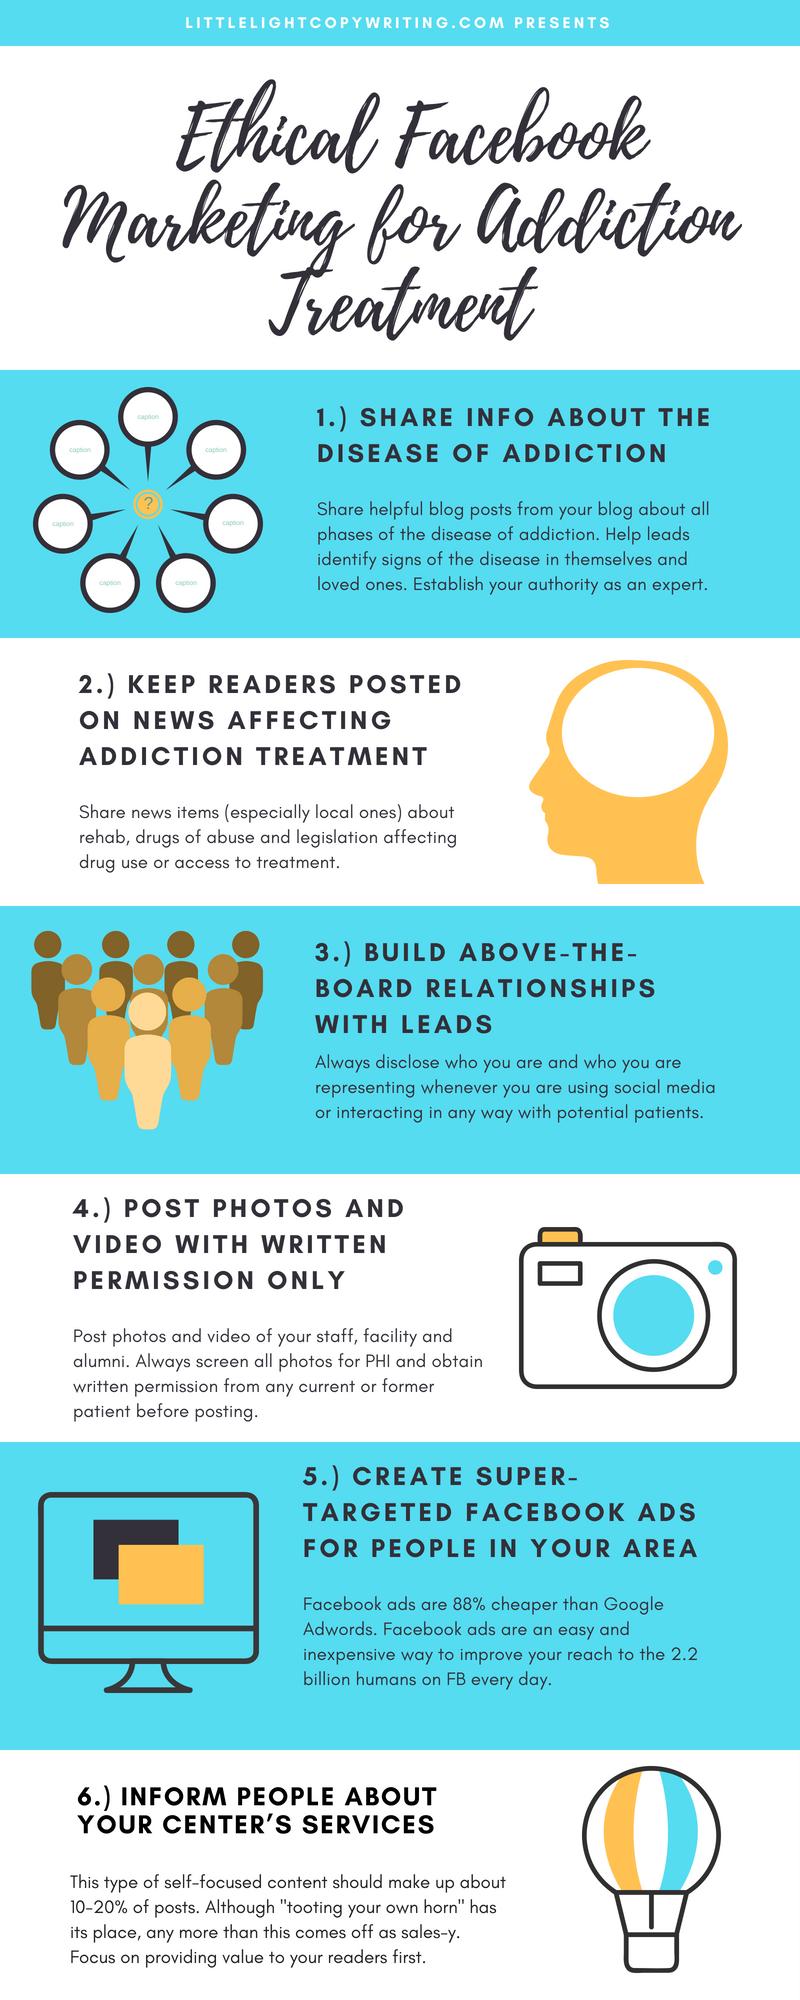 https://www.littlelightcopywriting.com/blog/2018/4/12/5-tips-for-hipaa-compliant-addiction-treatment-marketing